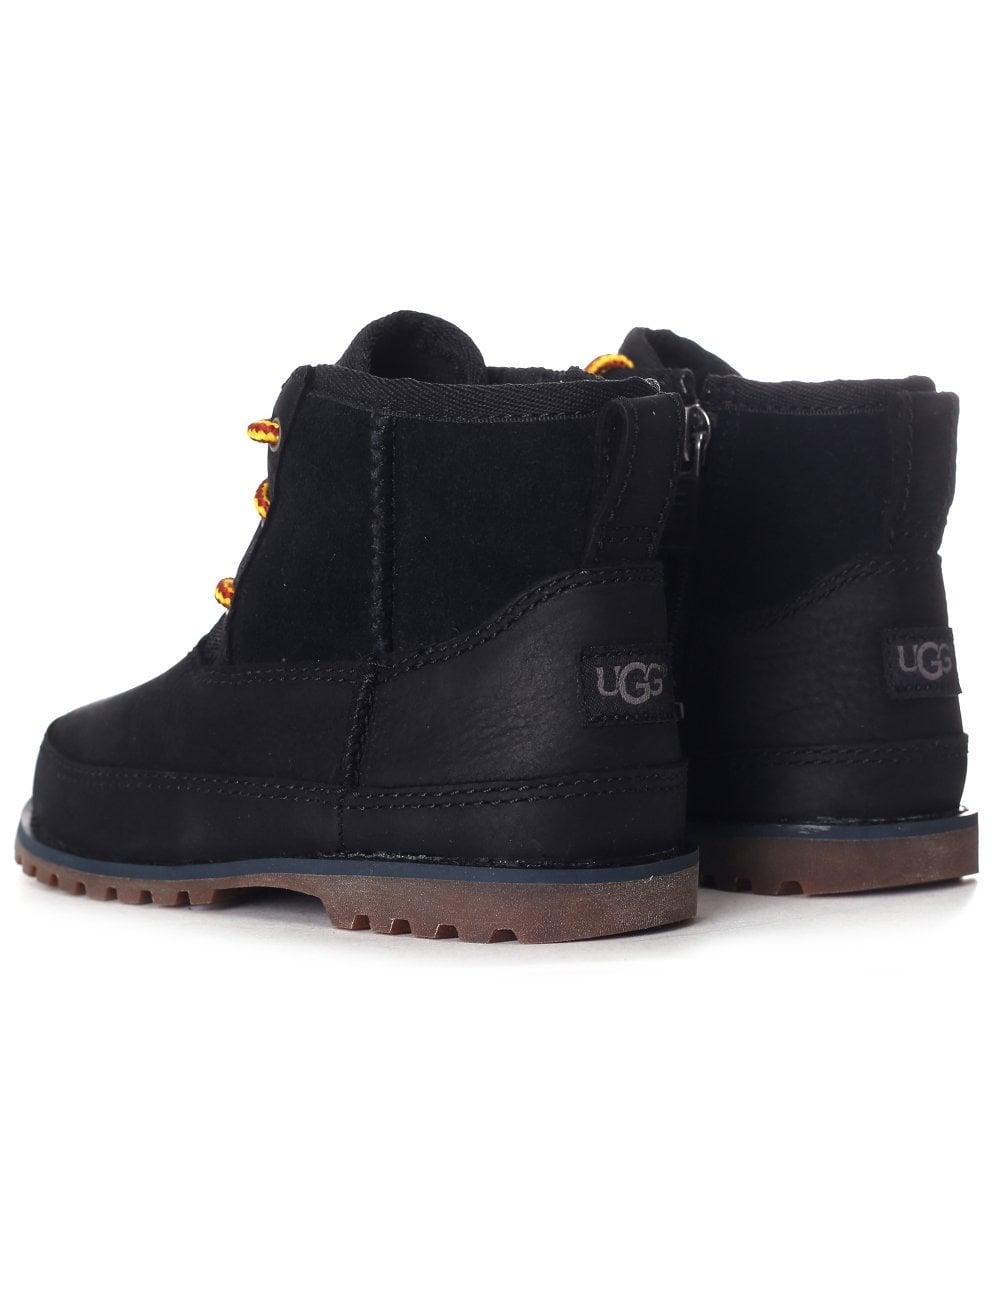 415ef68c032a Ugg T Bradley Girls Ankle Boots